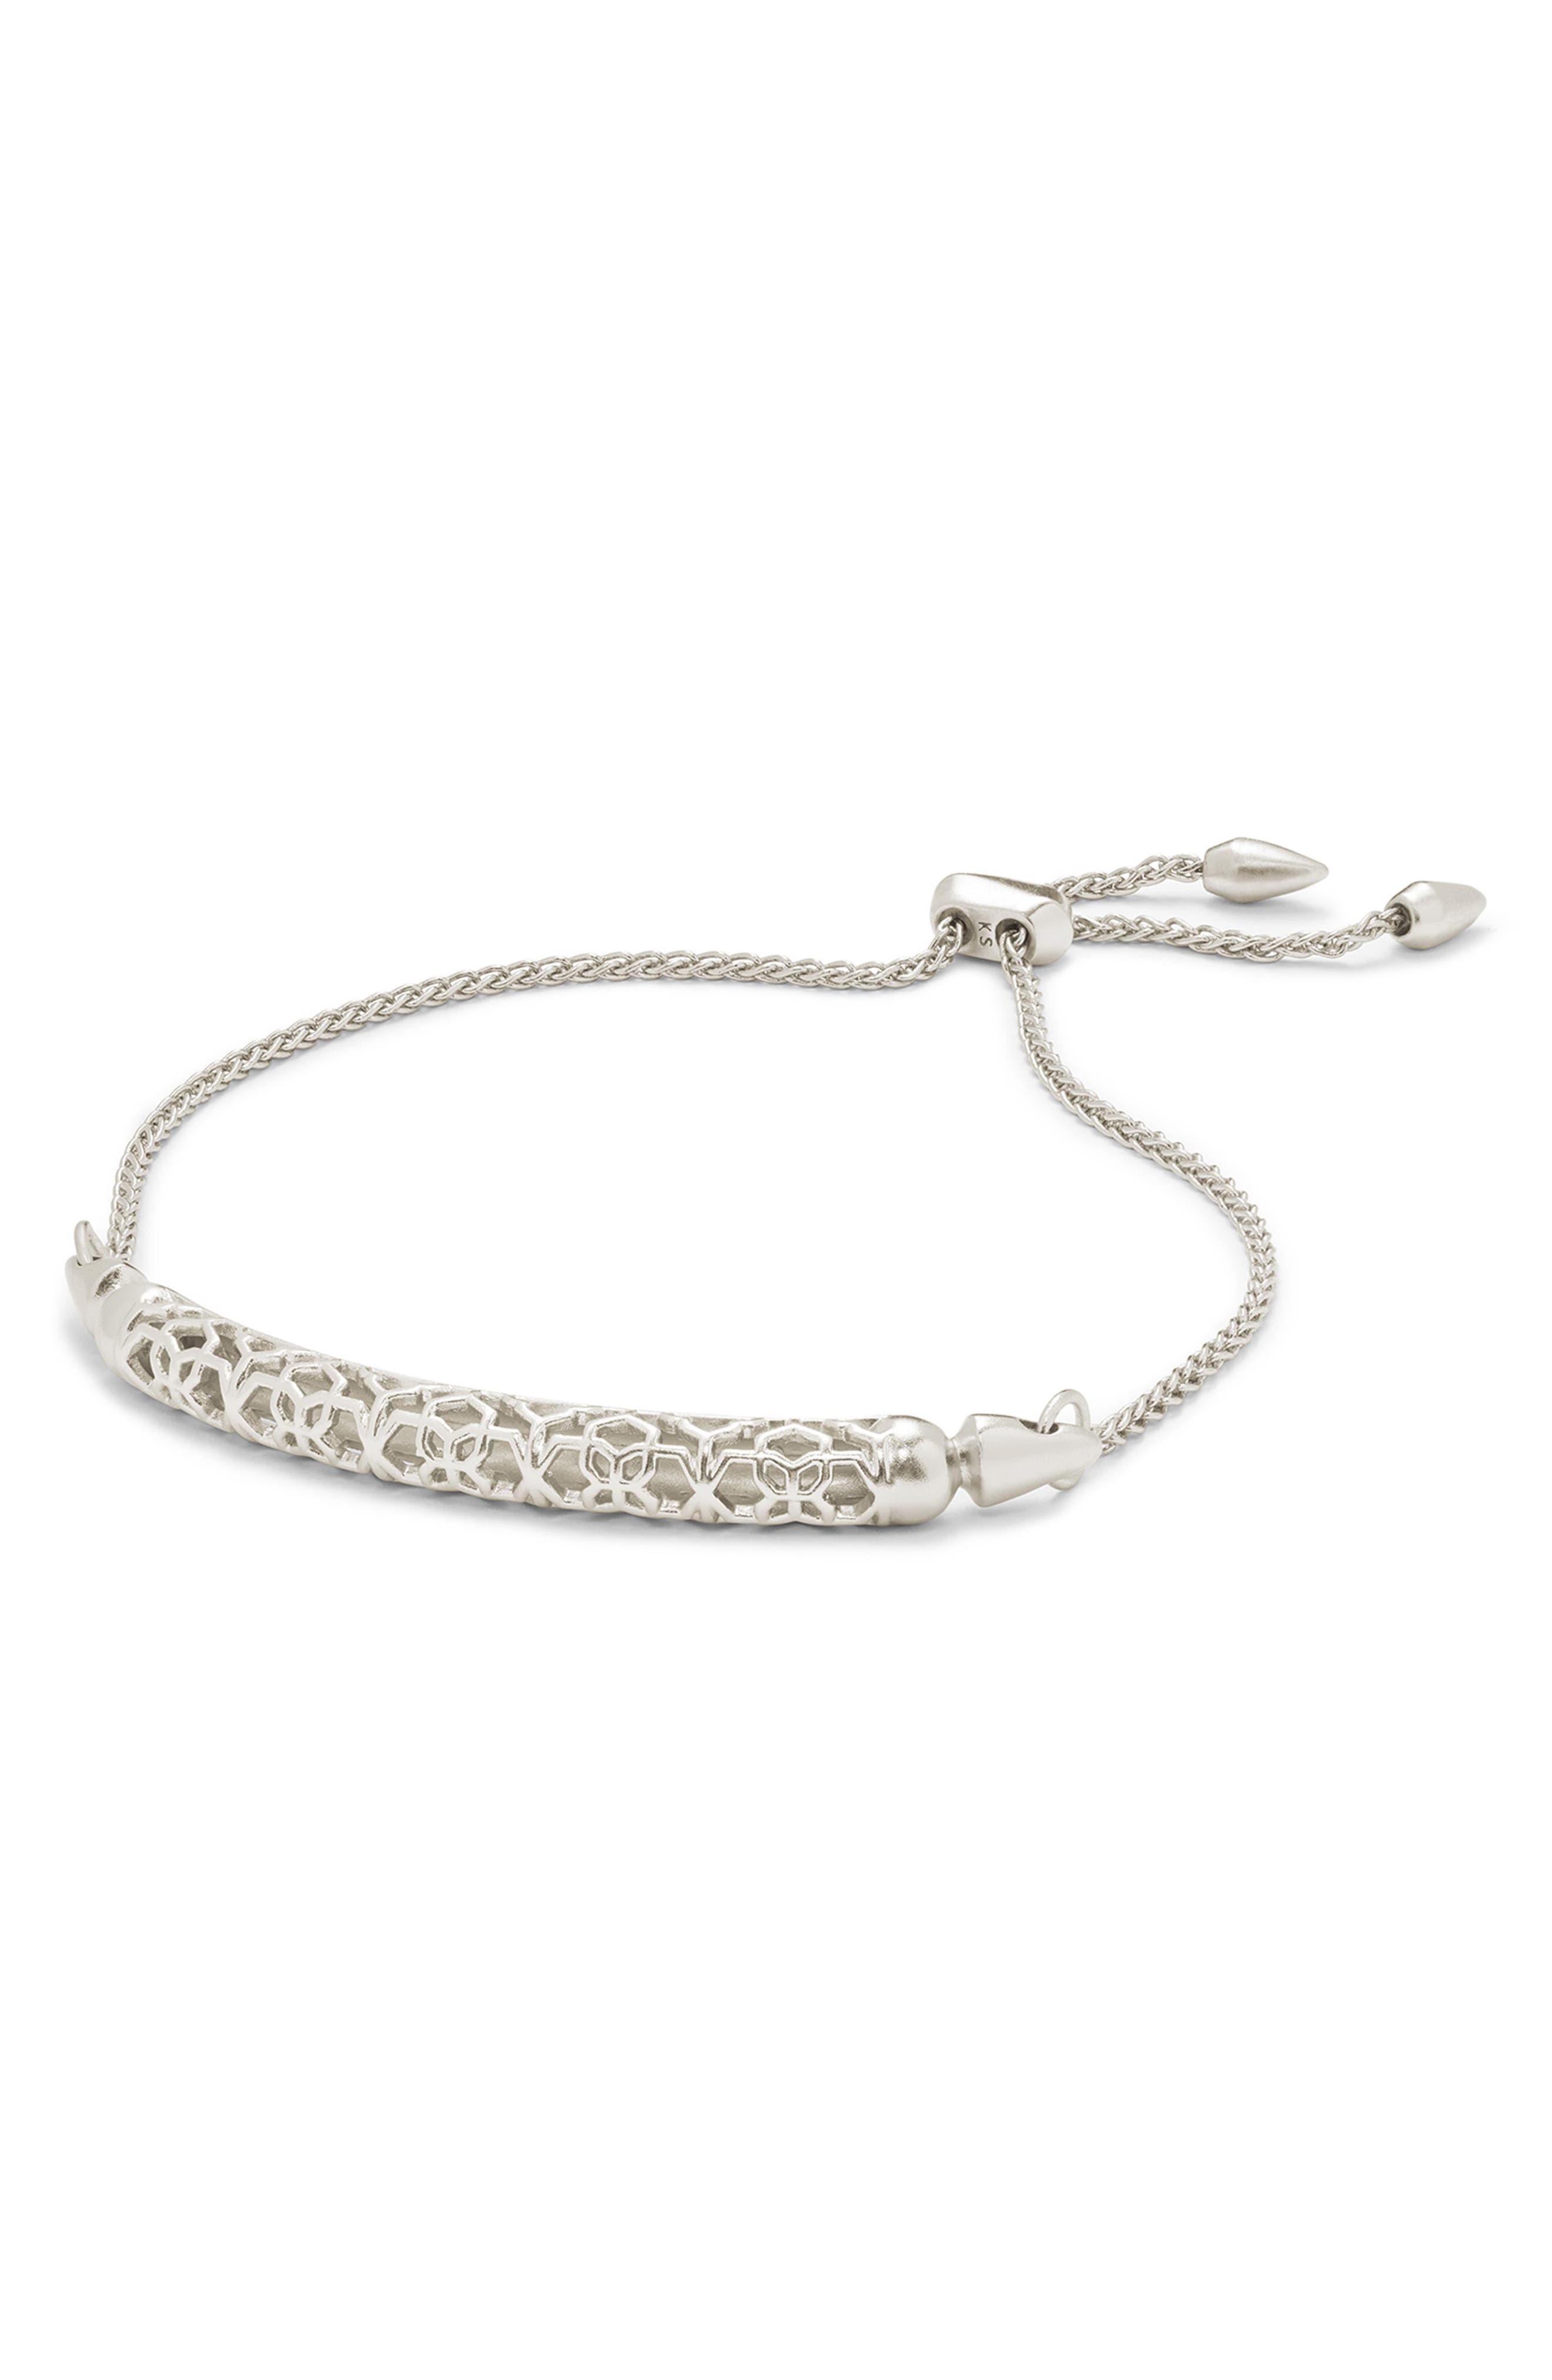 KENDRA SCOTT, Gilly Adjustable Bracelet, Alternate thumbnail 2, color, SILVER FILIGREE